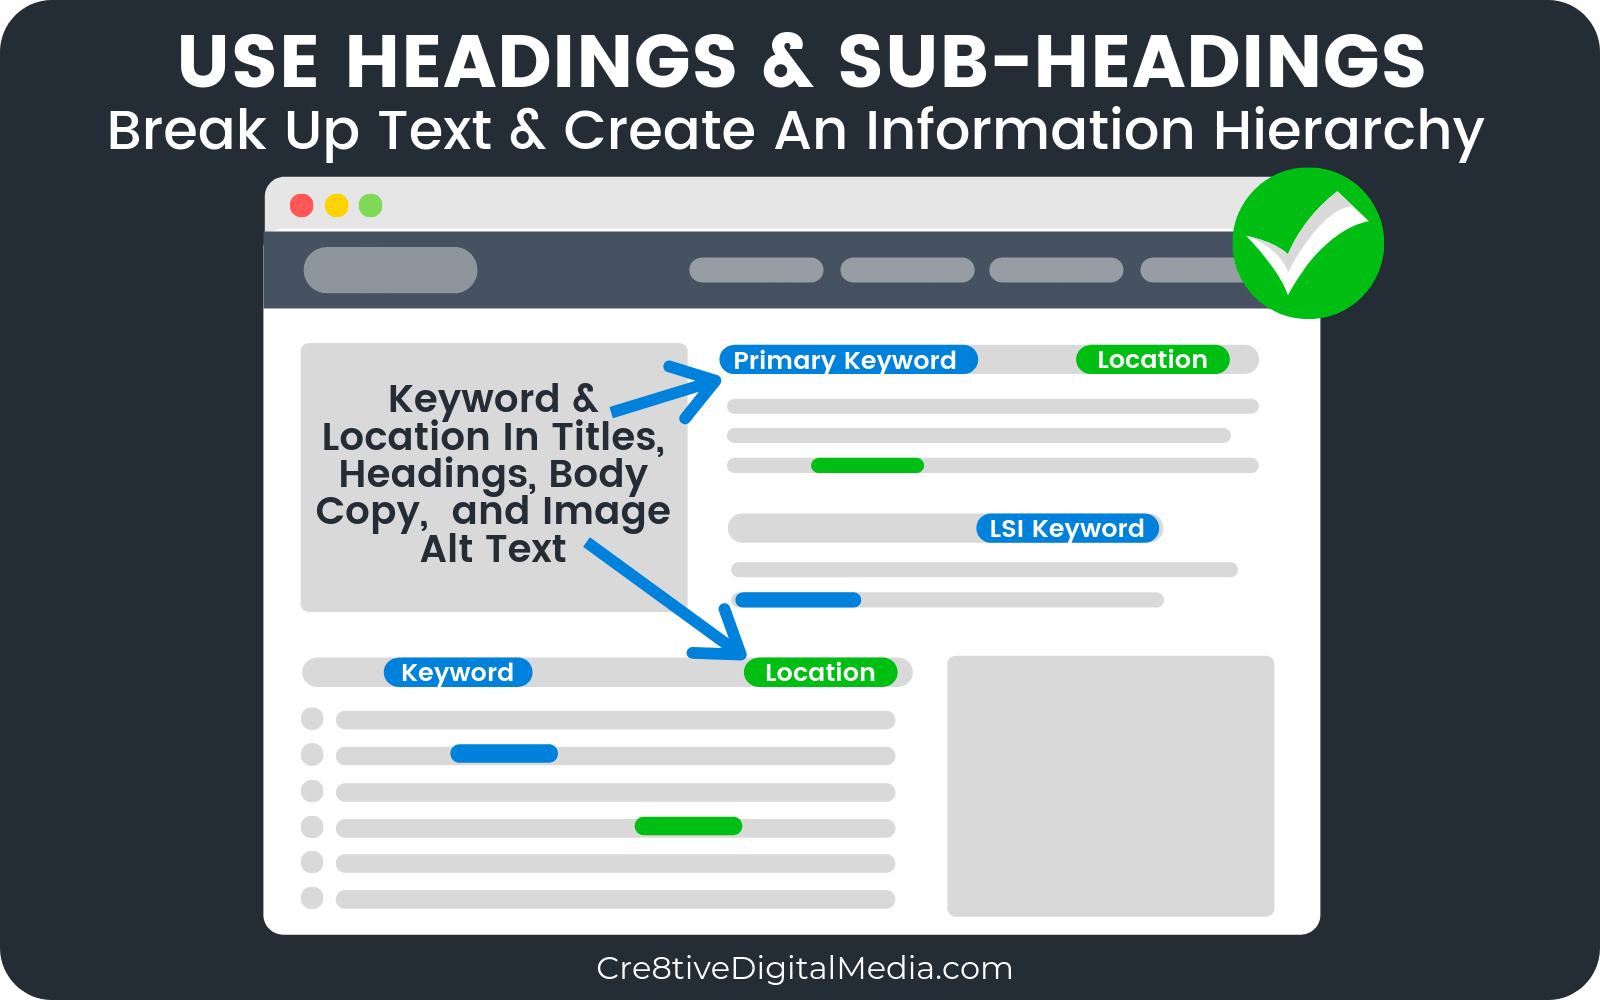 Local Keyword Optimized Headings & Sub-Headings